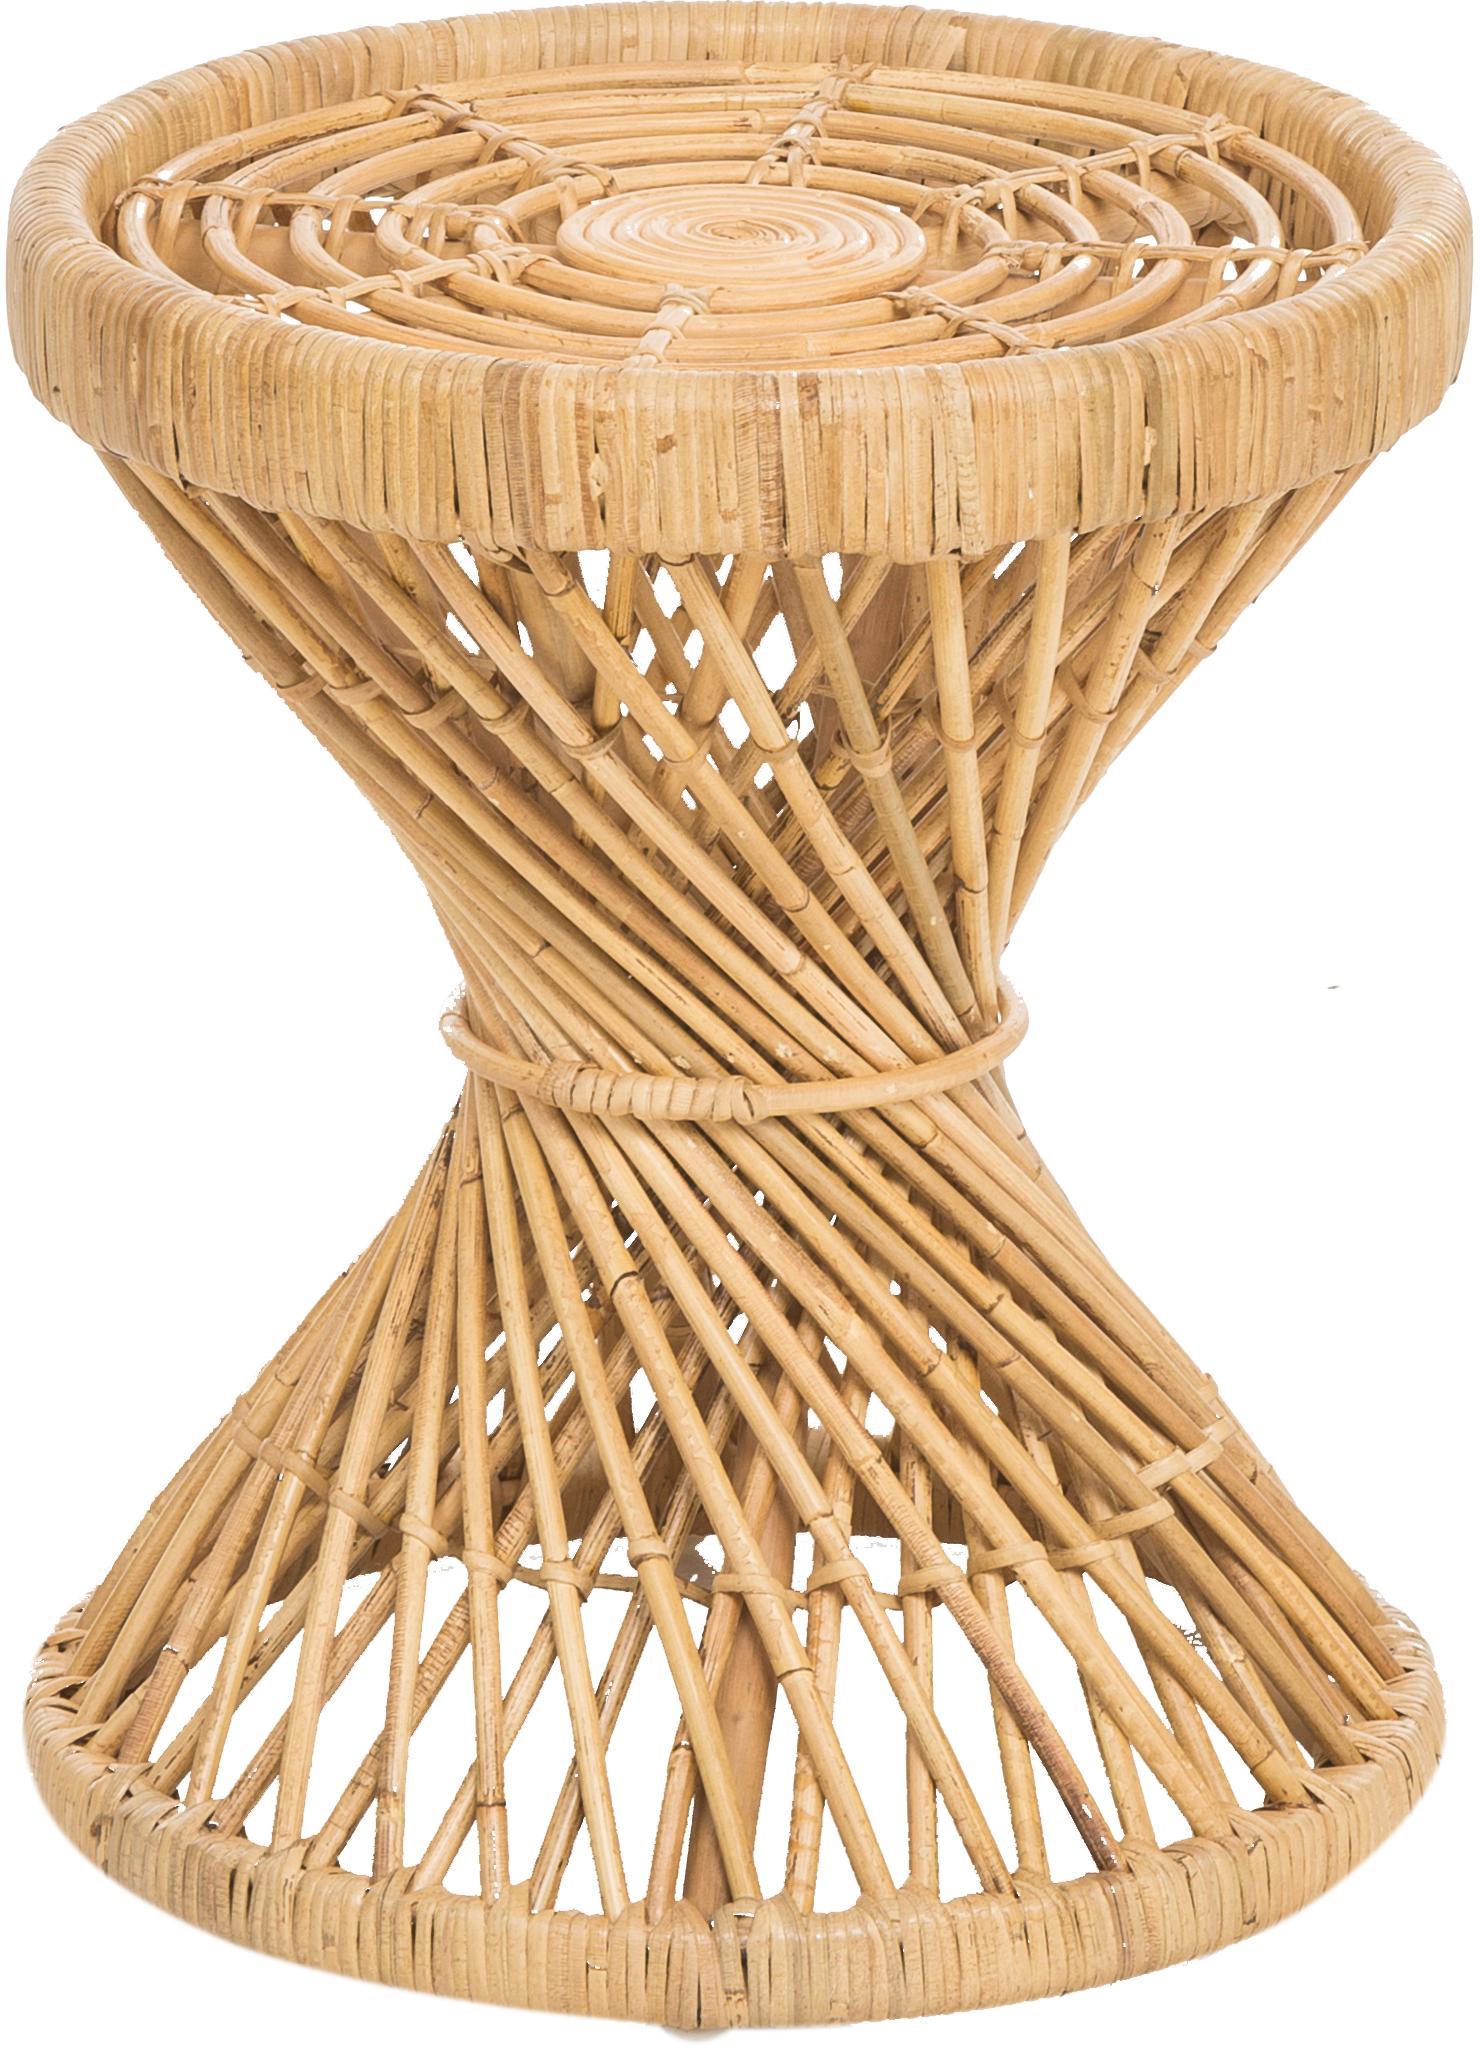 Rattan-Beistelltisch Marvel im Boho Style, Rattan, naturbelassen, Braun, Ø 40 x H 47 cm